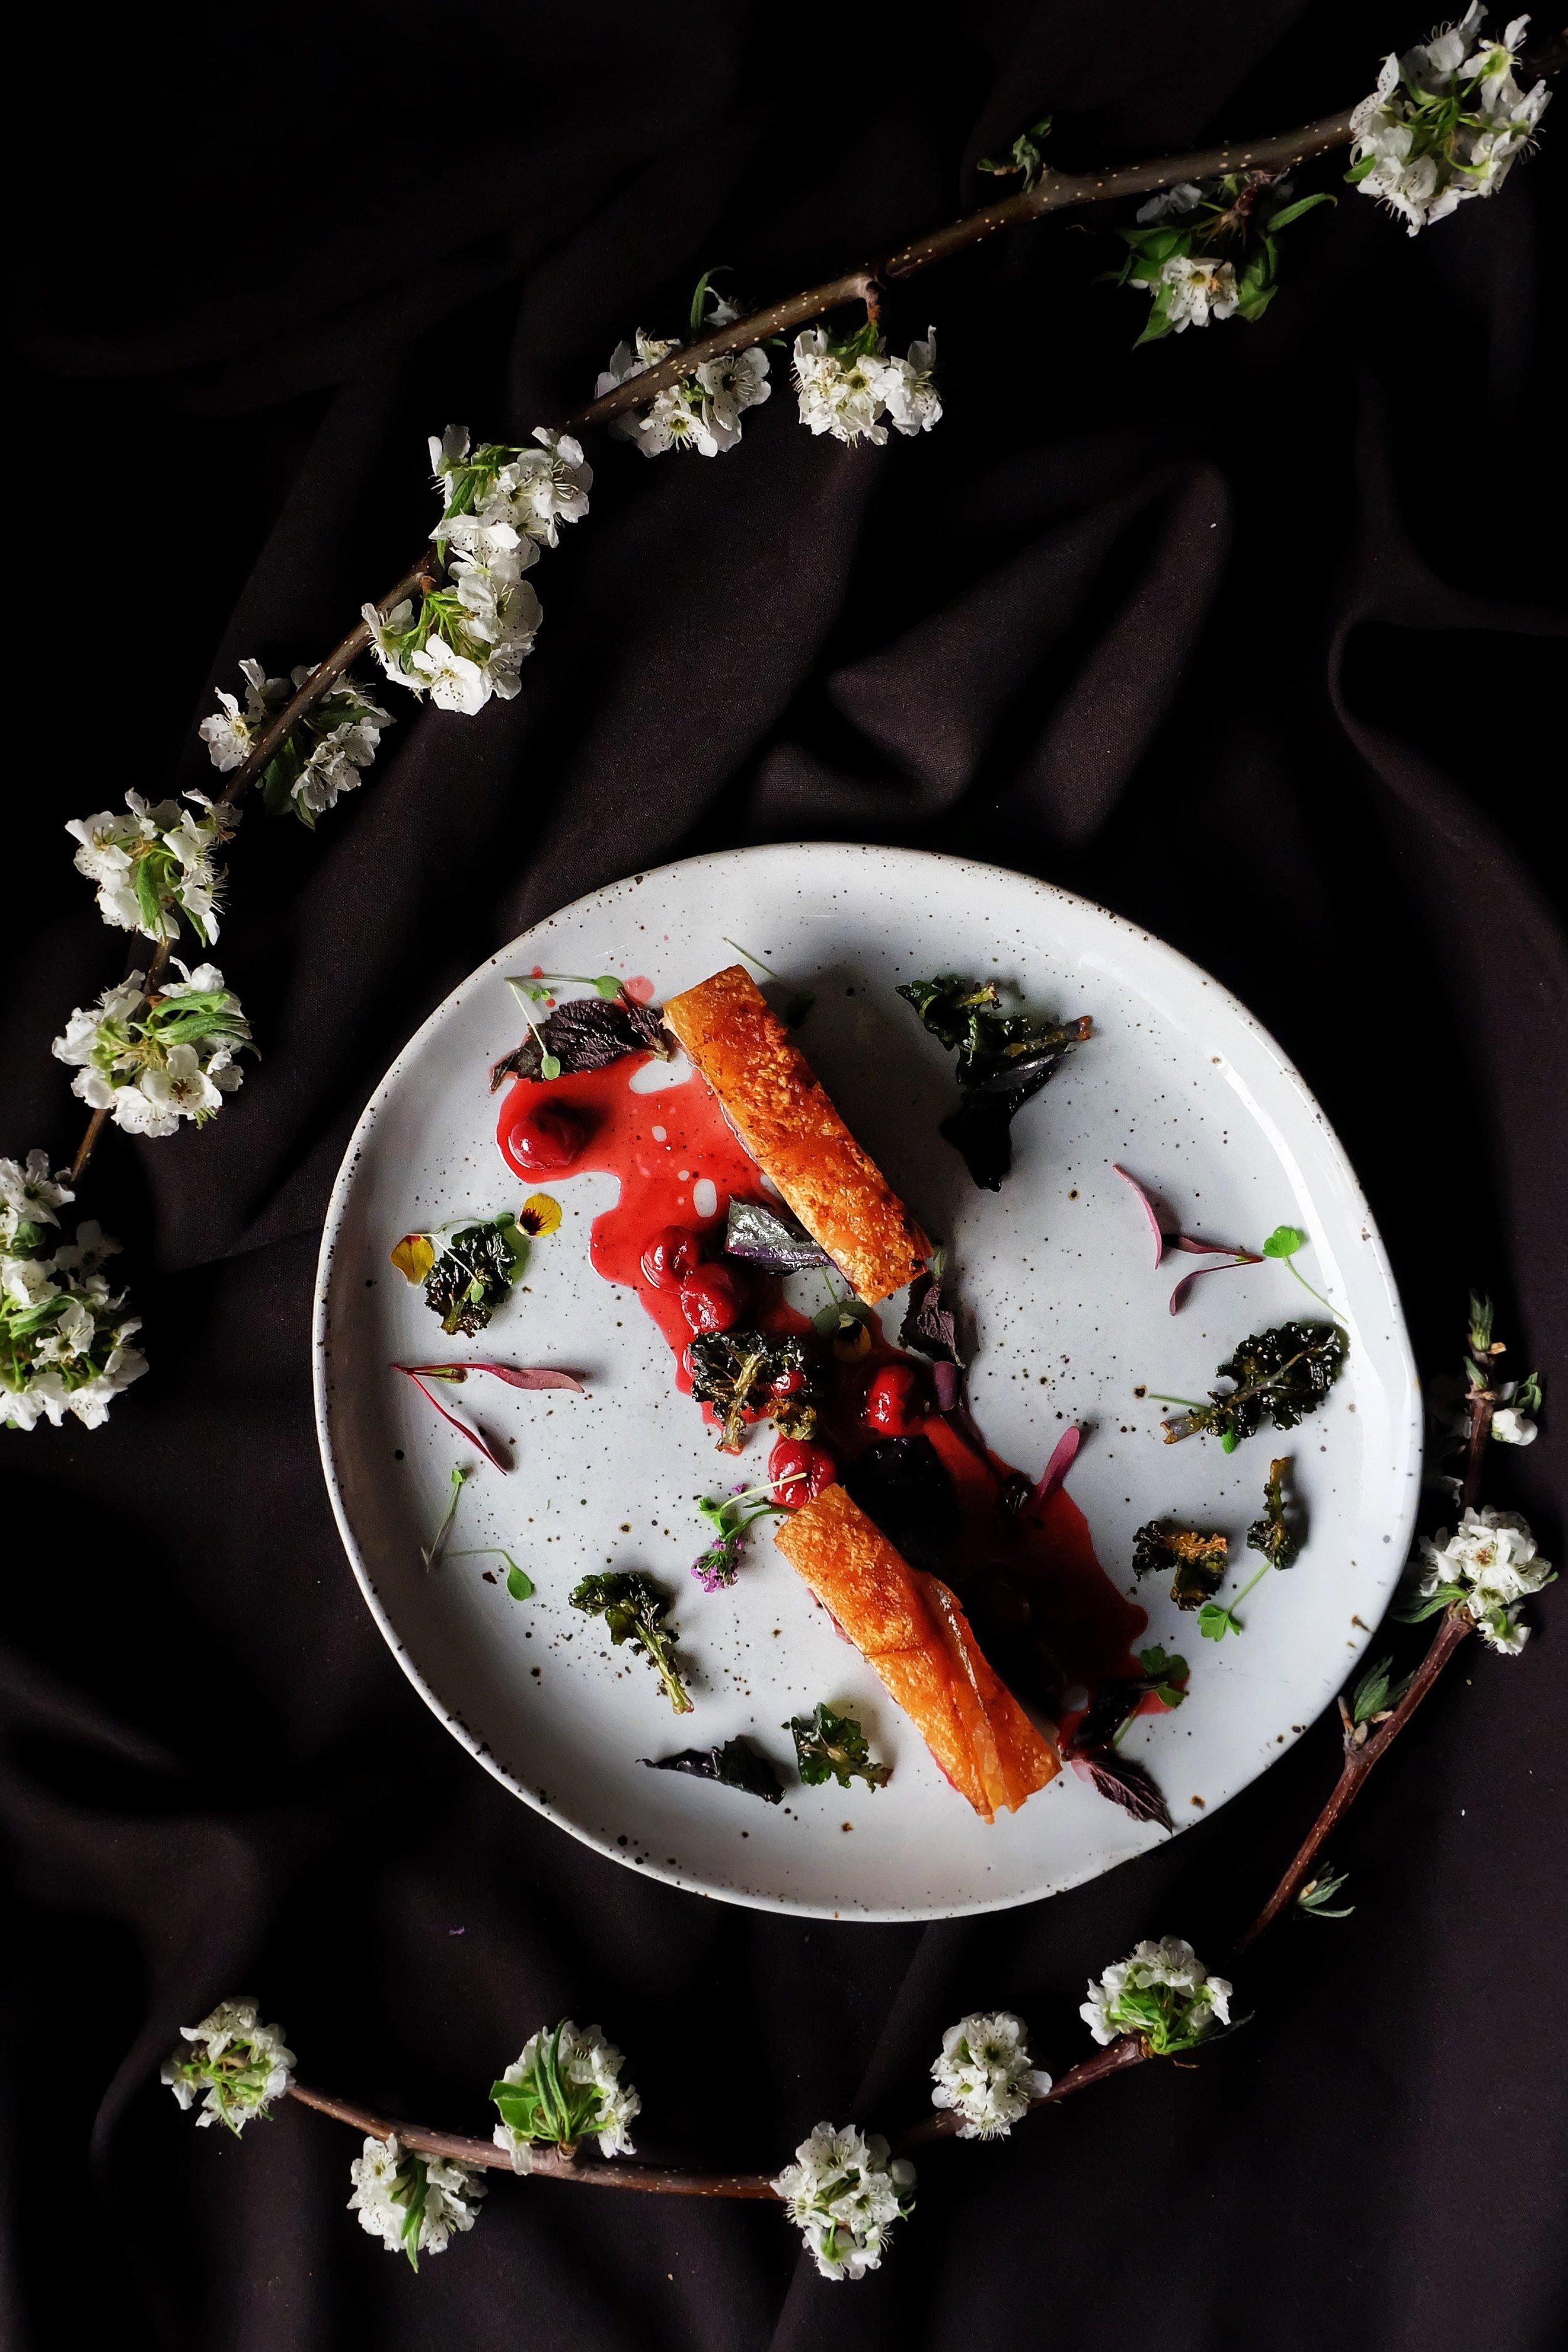 Cherry Pork Dinner at First Edition Canberra Restaurant